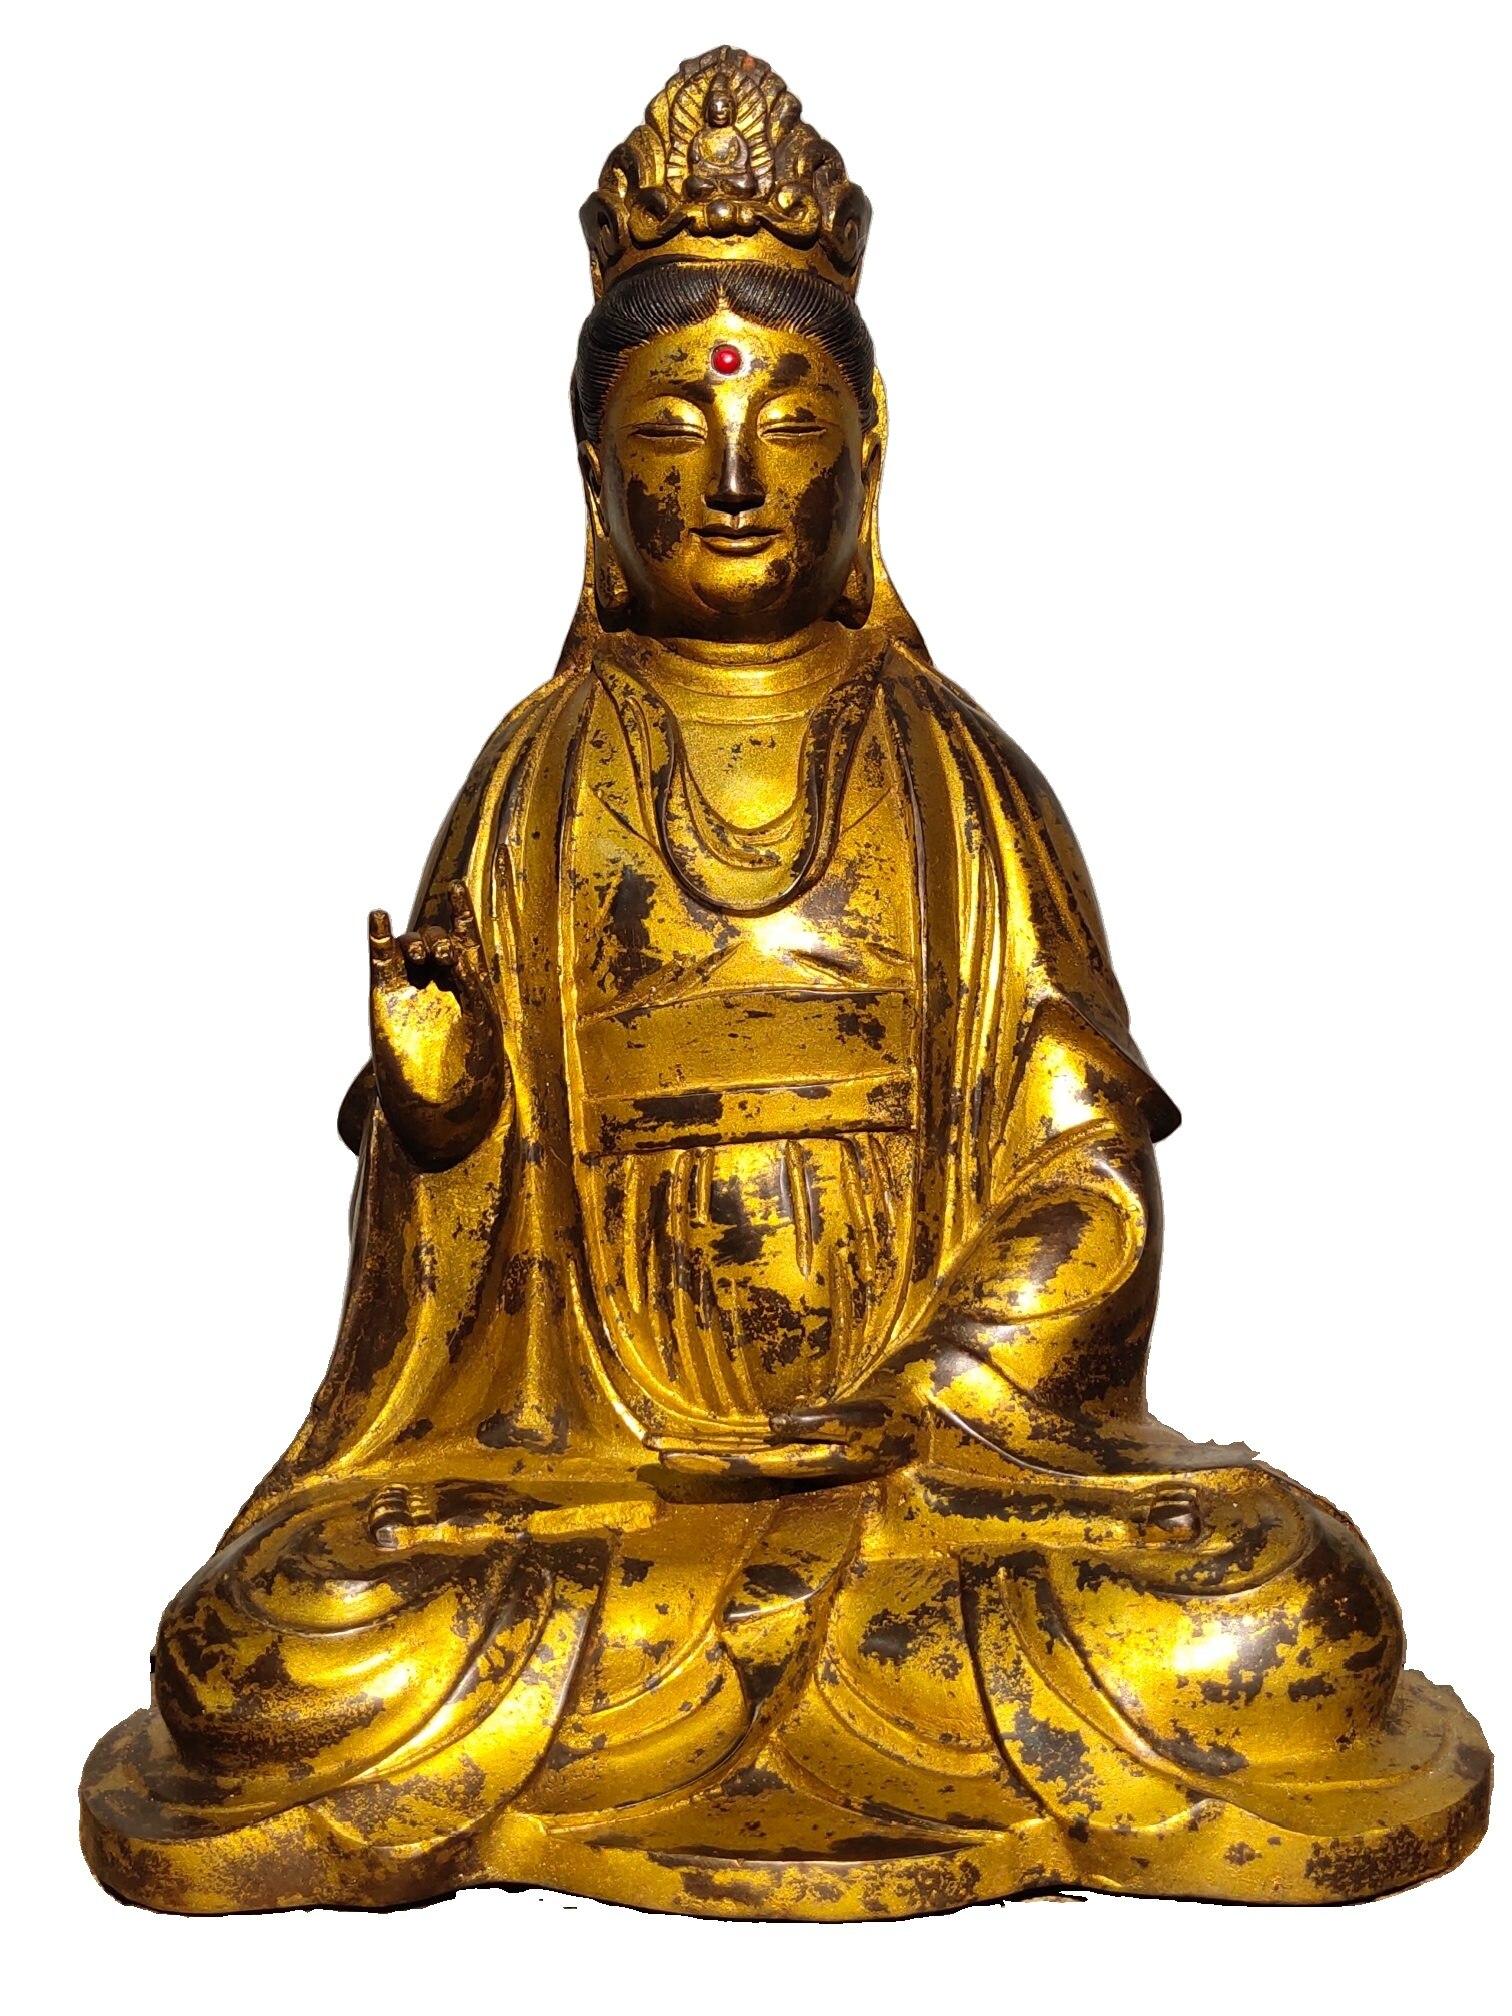 Laojunlu النحاس النقي و مذهب تمثال بوذا القديم في مجموعة التبت القديمة غوان شي يين بوديساتفا ، باحترام